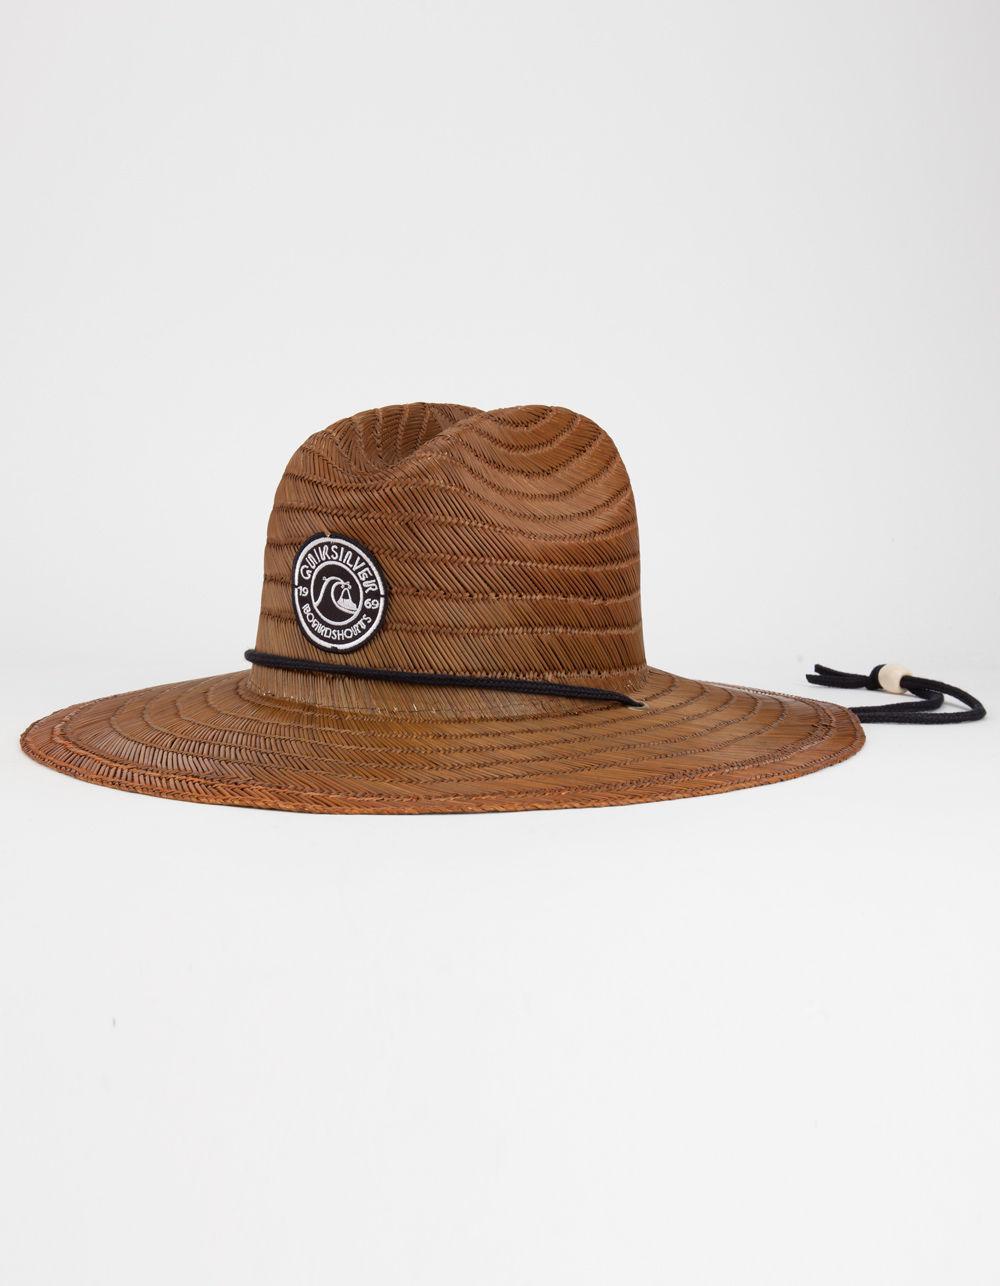 19390ac5 ... authentic lyst quiksilver pierside mens lifeguard hat in brown for men  588e4 7beb5